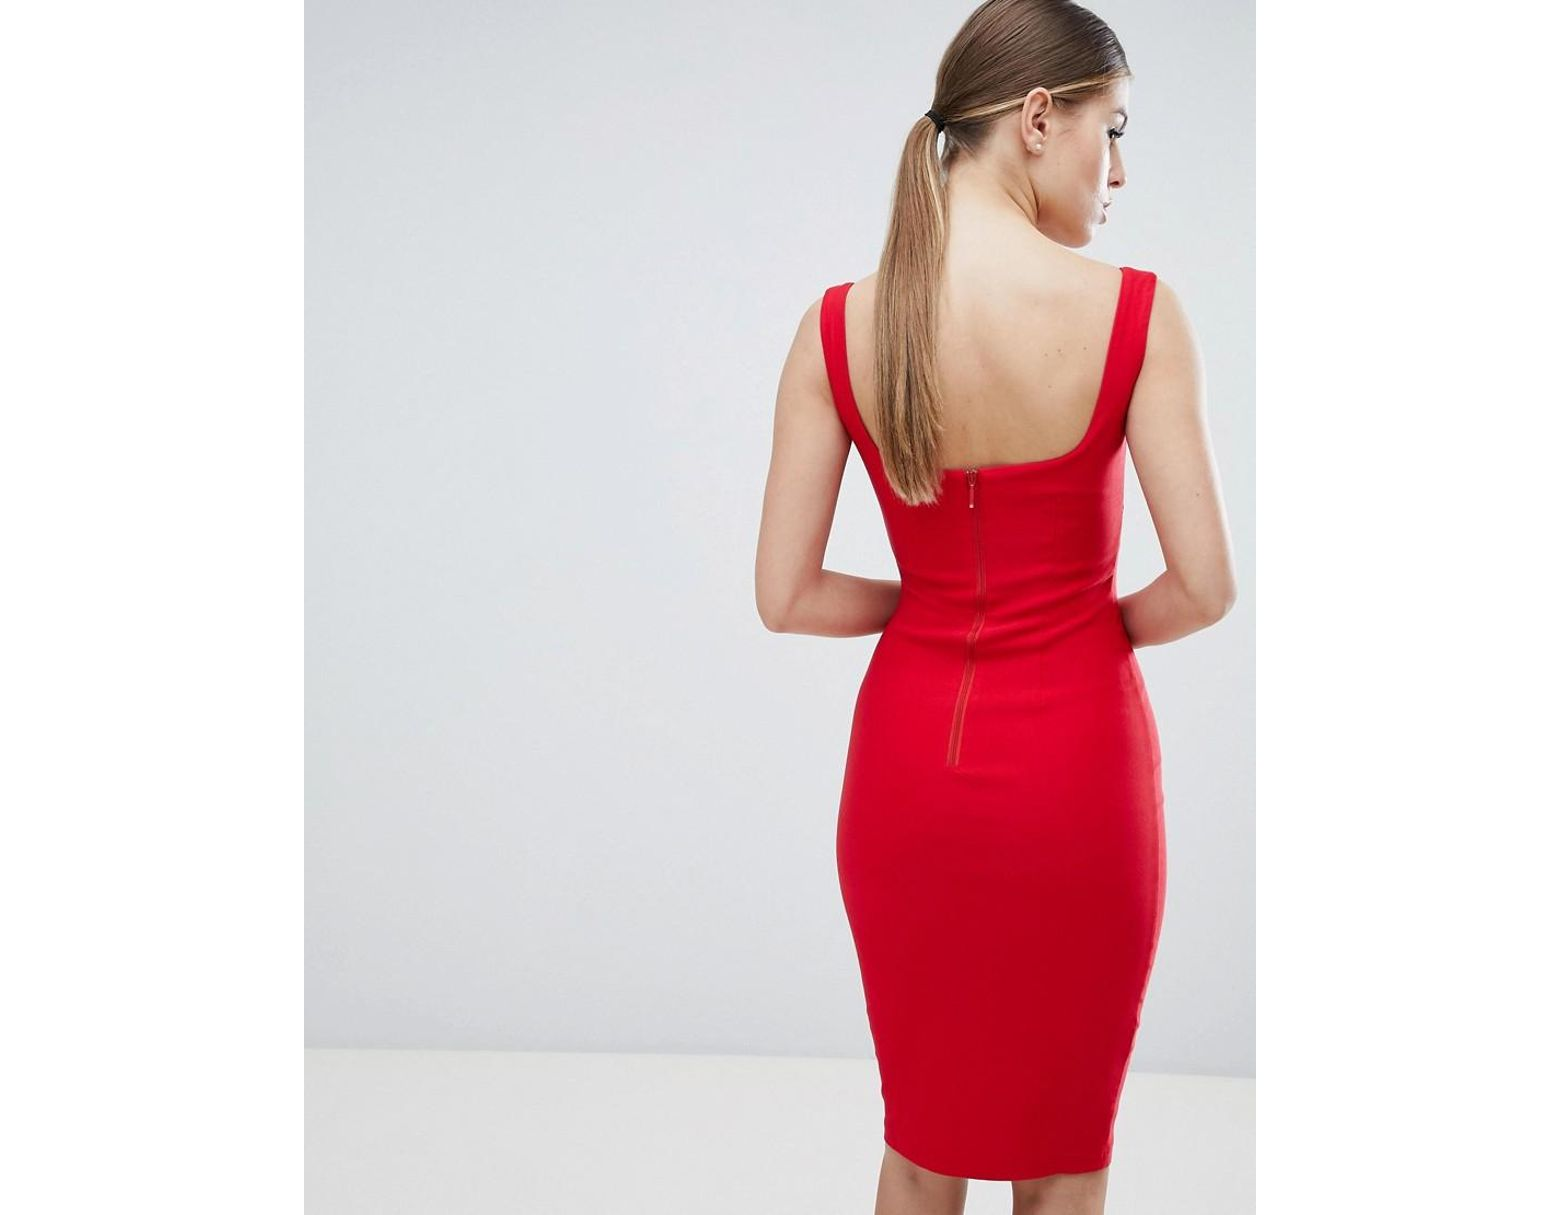 15e407be20cc5 Damen Rotes Bleistiftkleid mit eckigem Ausschnitt